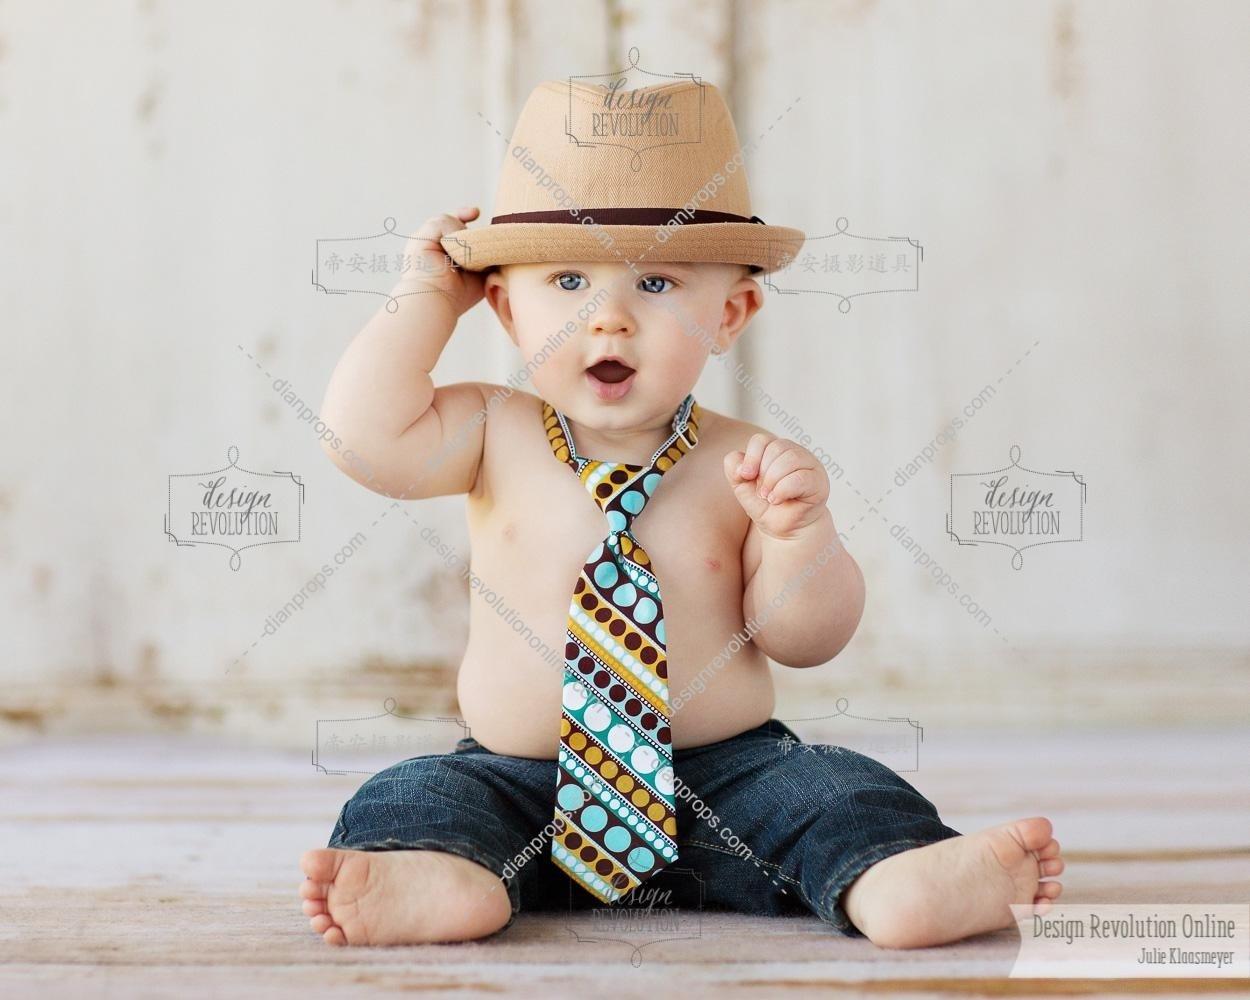 10 Stunning Baby Boy Photo Shoot Ideas baby boy photo ideas baby boy photos boy photos and photography 2021